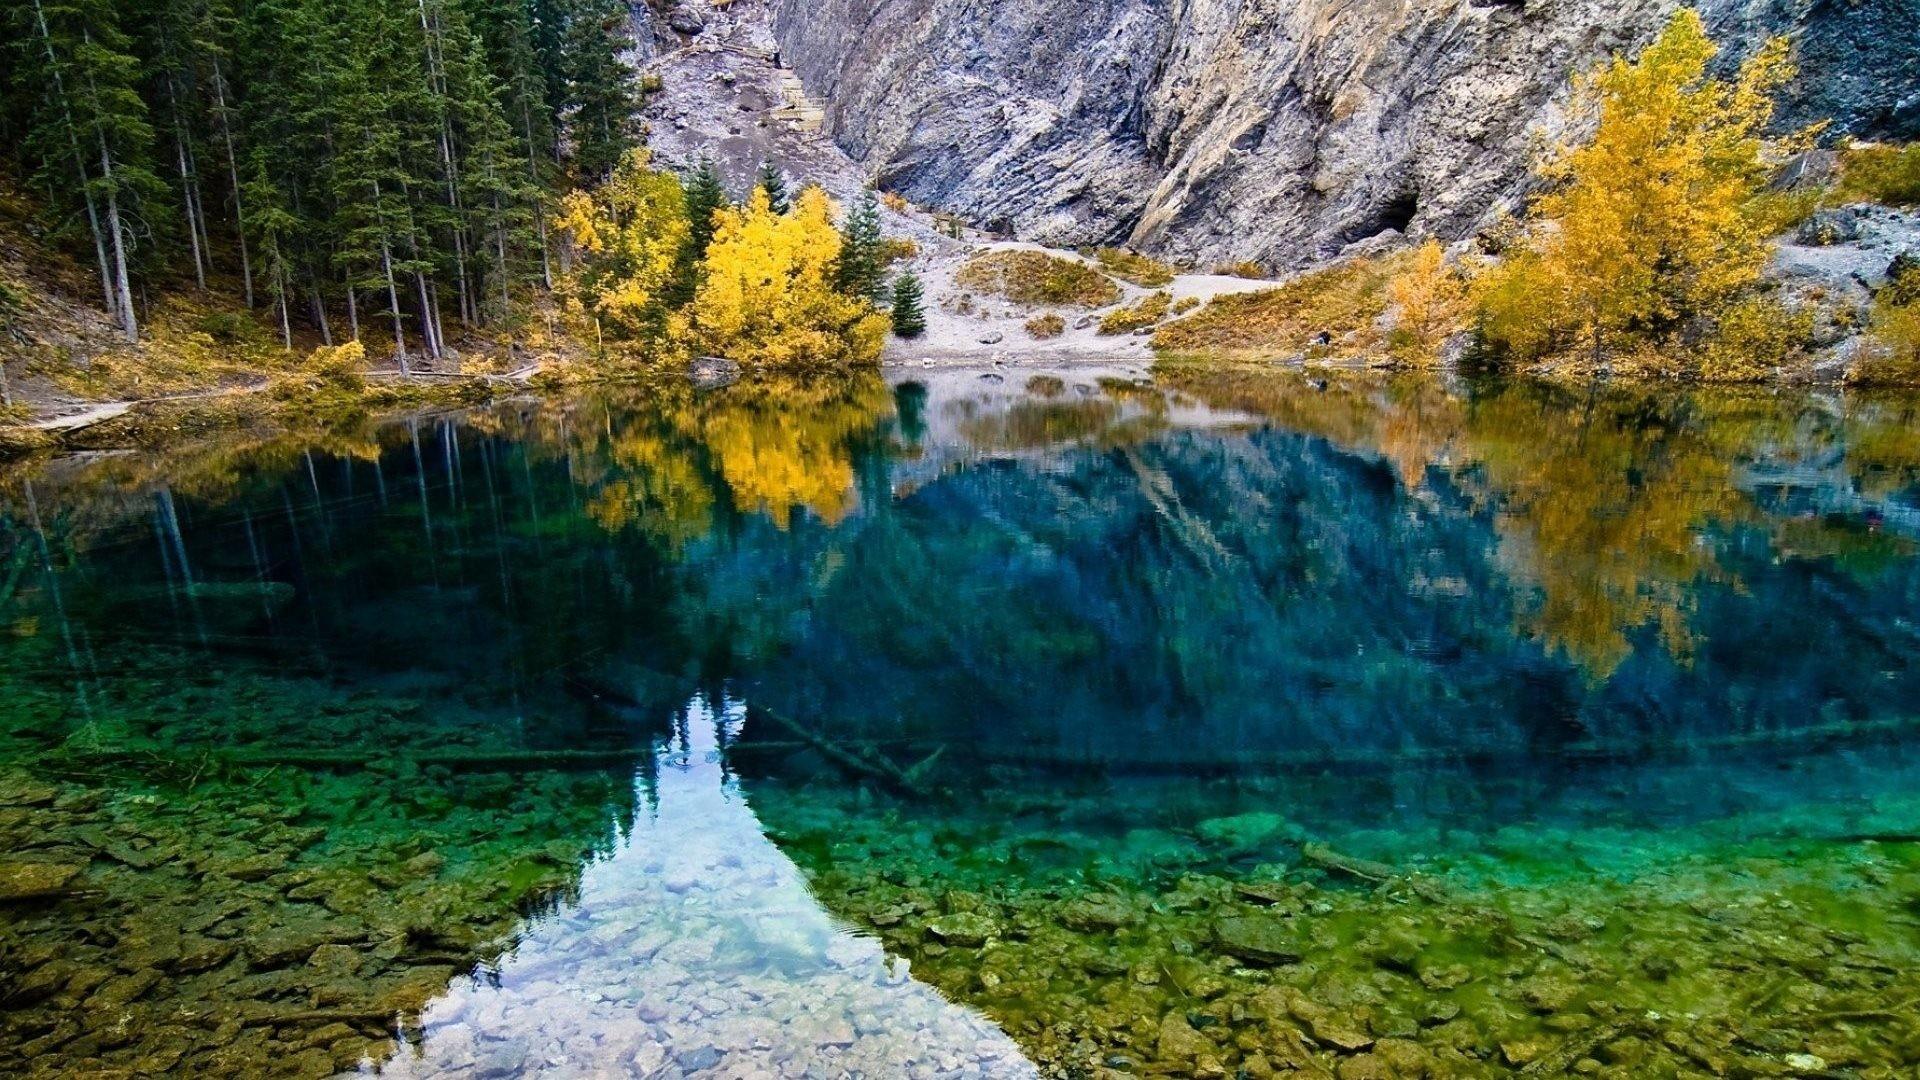 Reflection Rocks Autumn Mountain Lake Trees Forest Full Hd Desktop Nature  Wallpaper